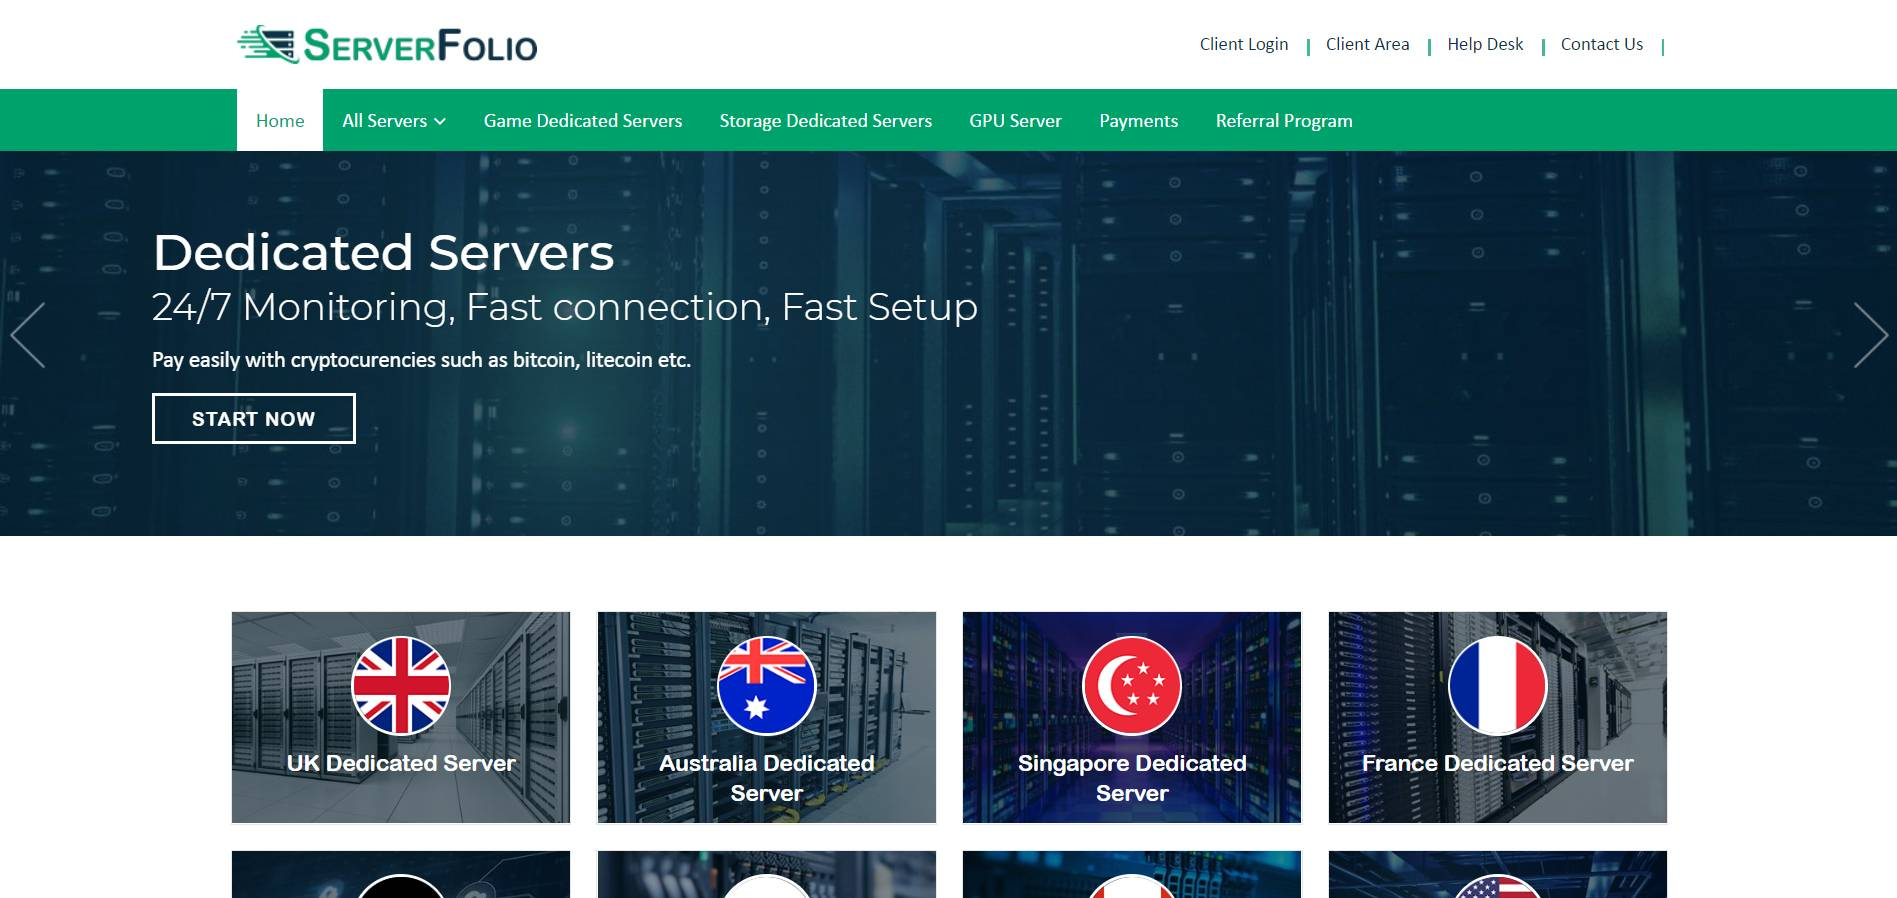 ServerFolio